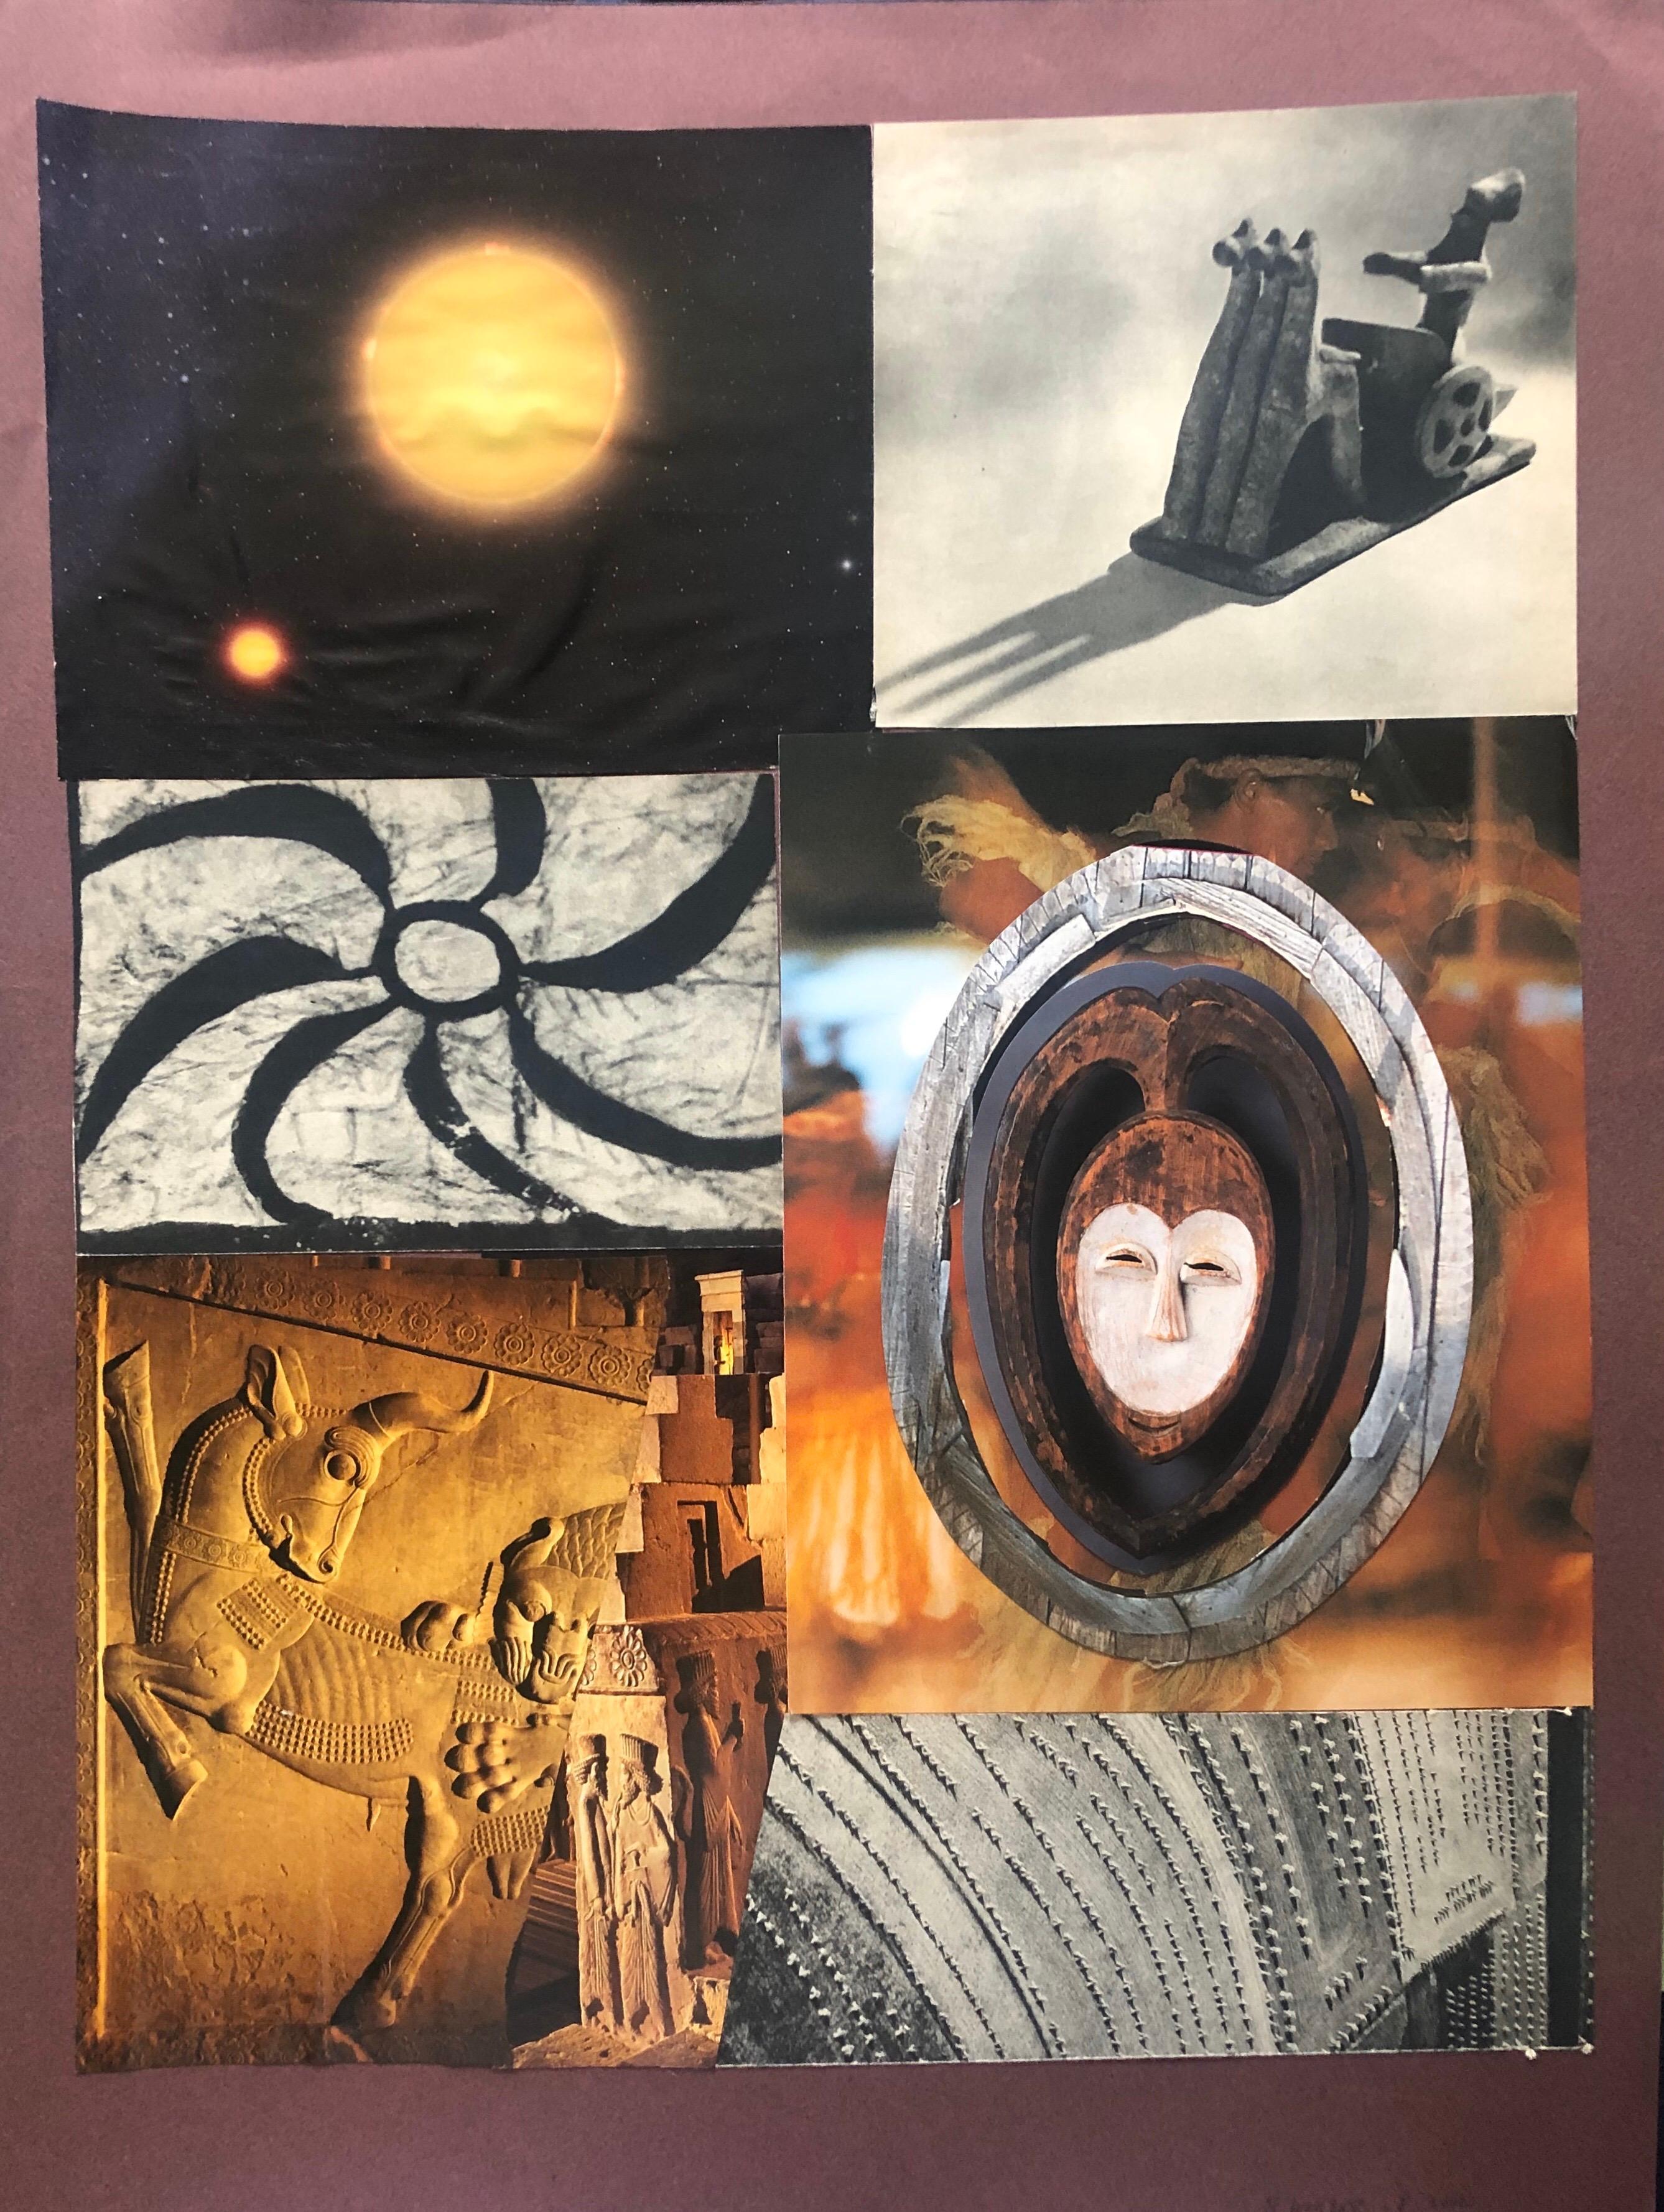 20th Paris School Collage Cutout Artwork Wonderful Interior Design options!